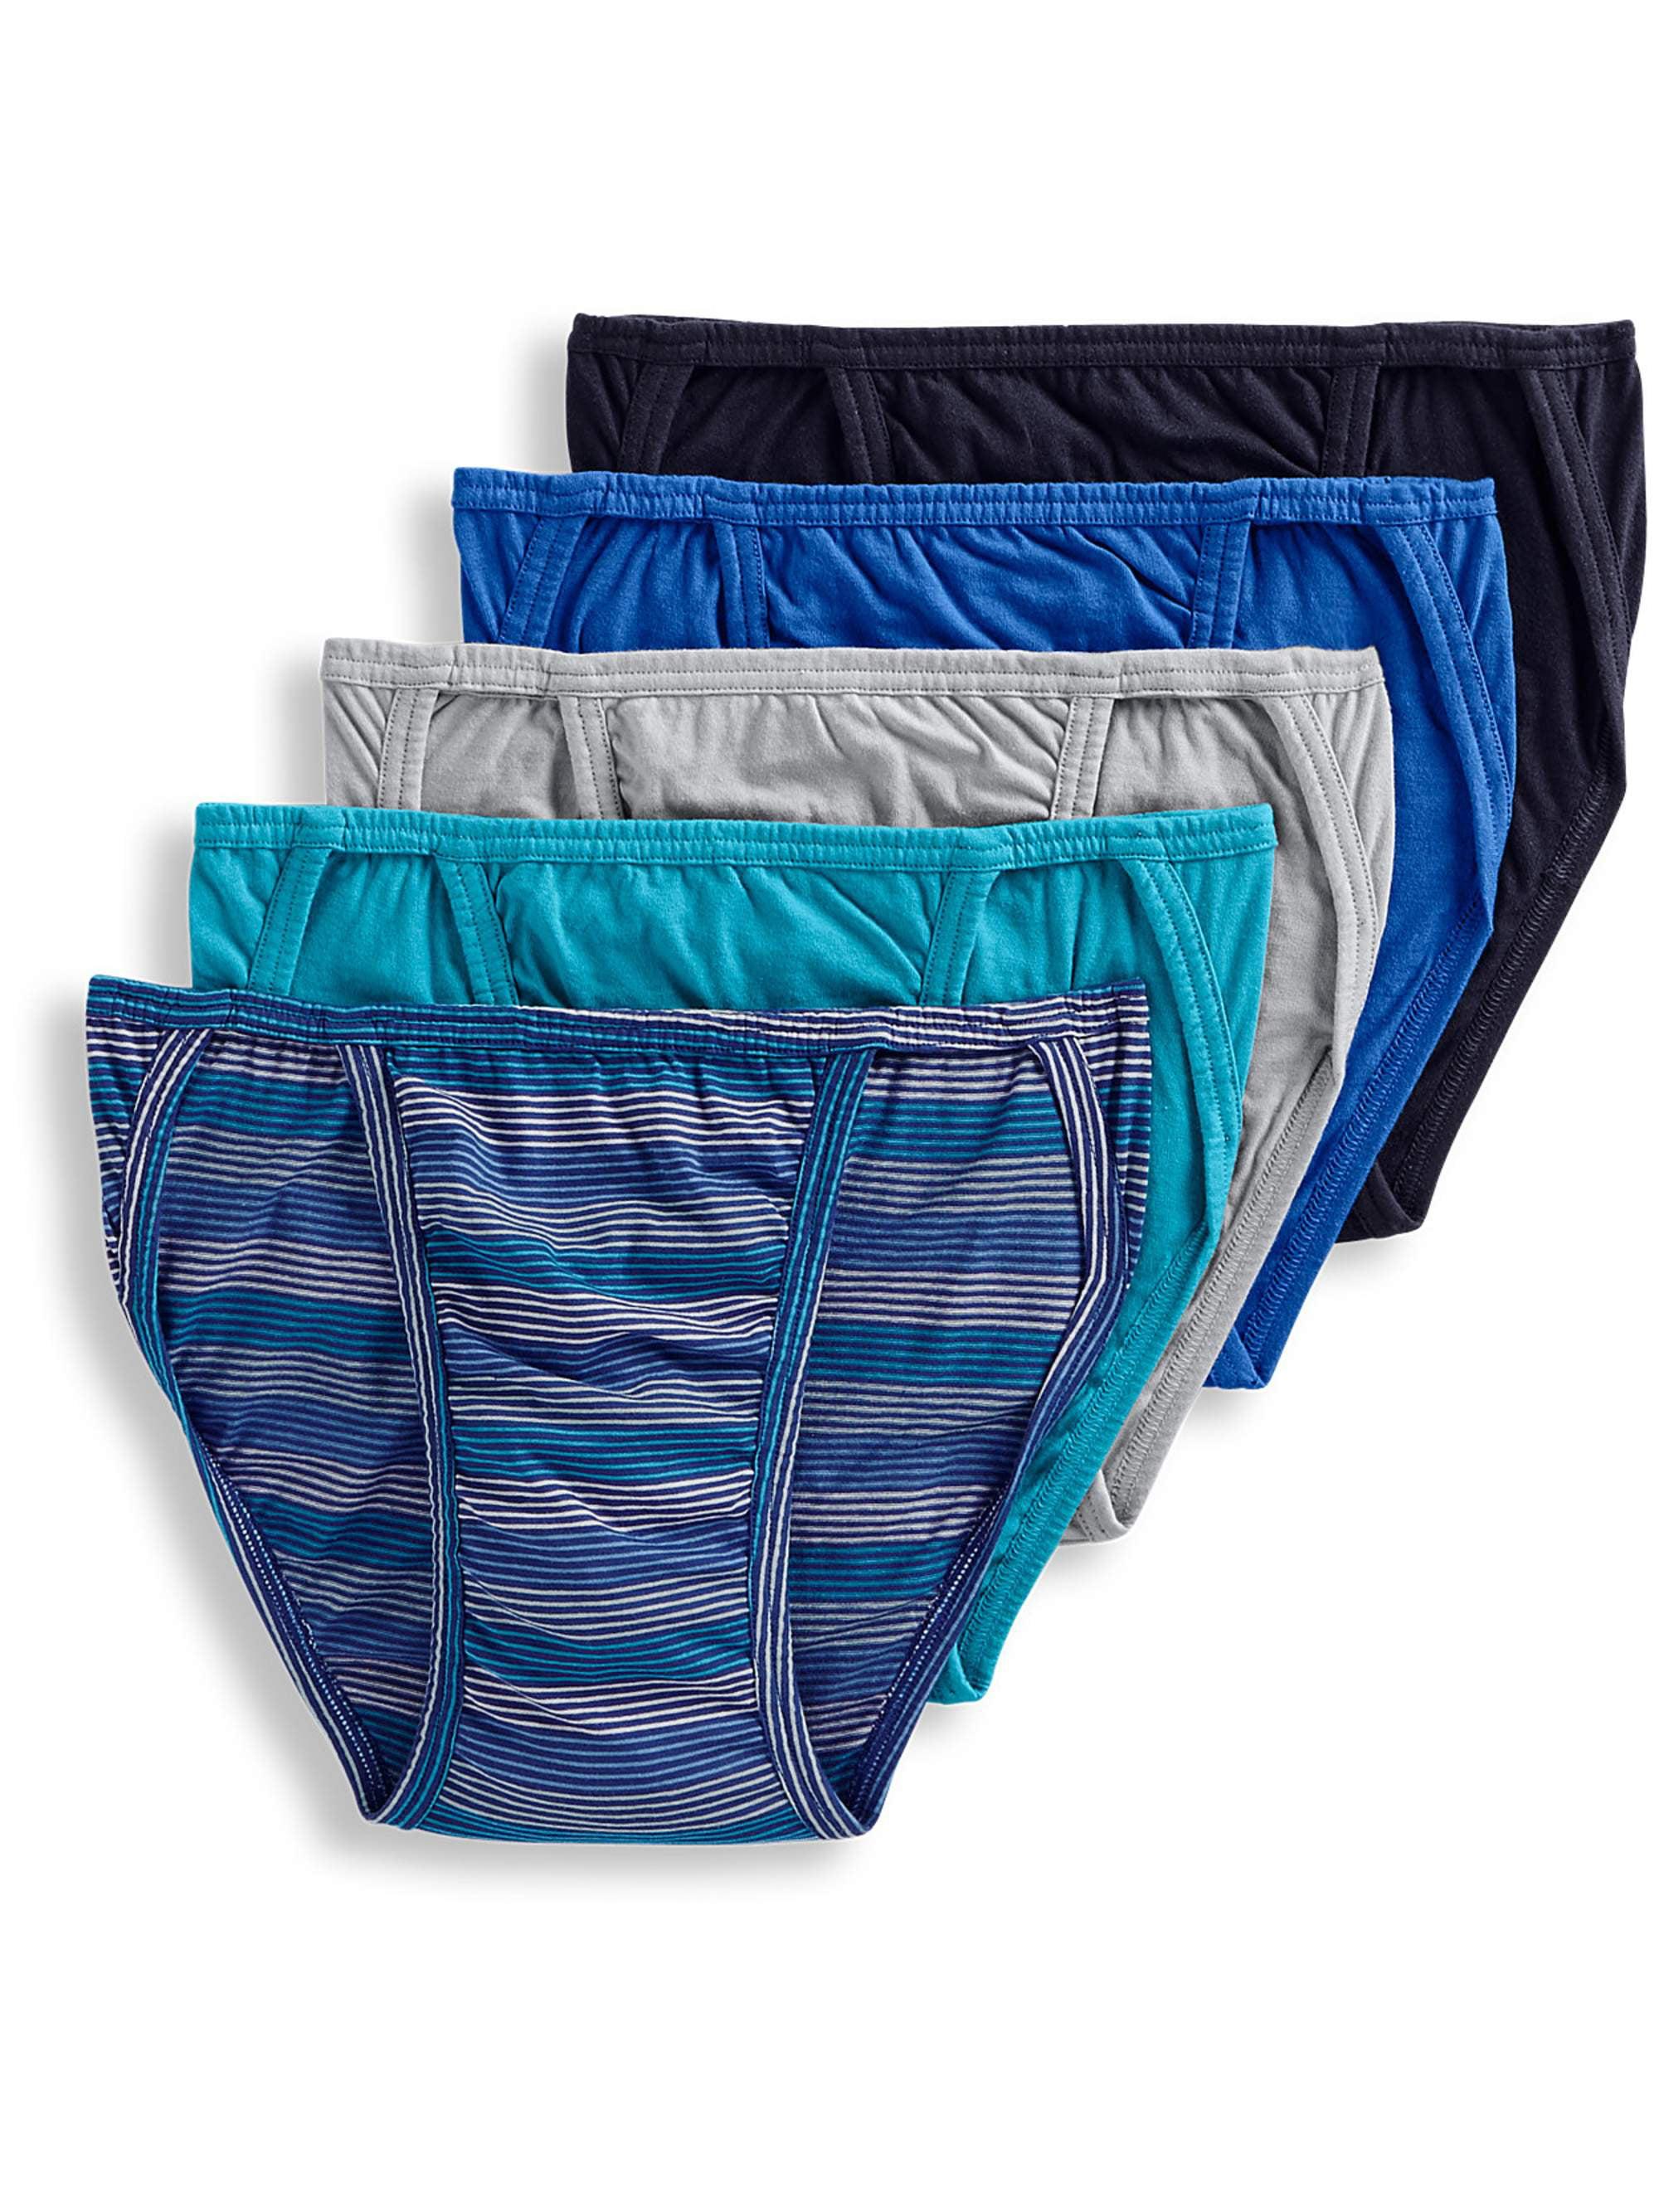 Jockey Life® - Men's 24/7 Comfort Cotton String Bikini - 5 pack -  Walmart.com - Walmart.com